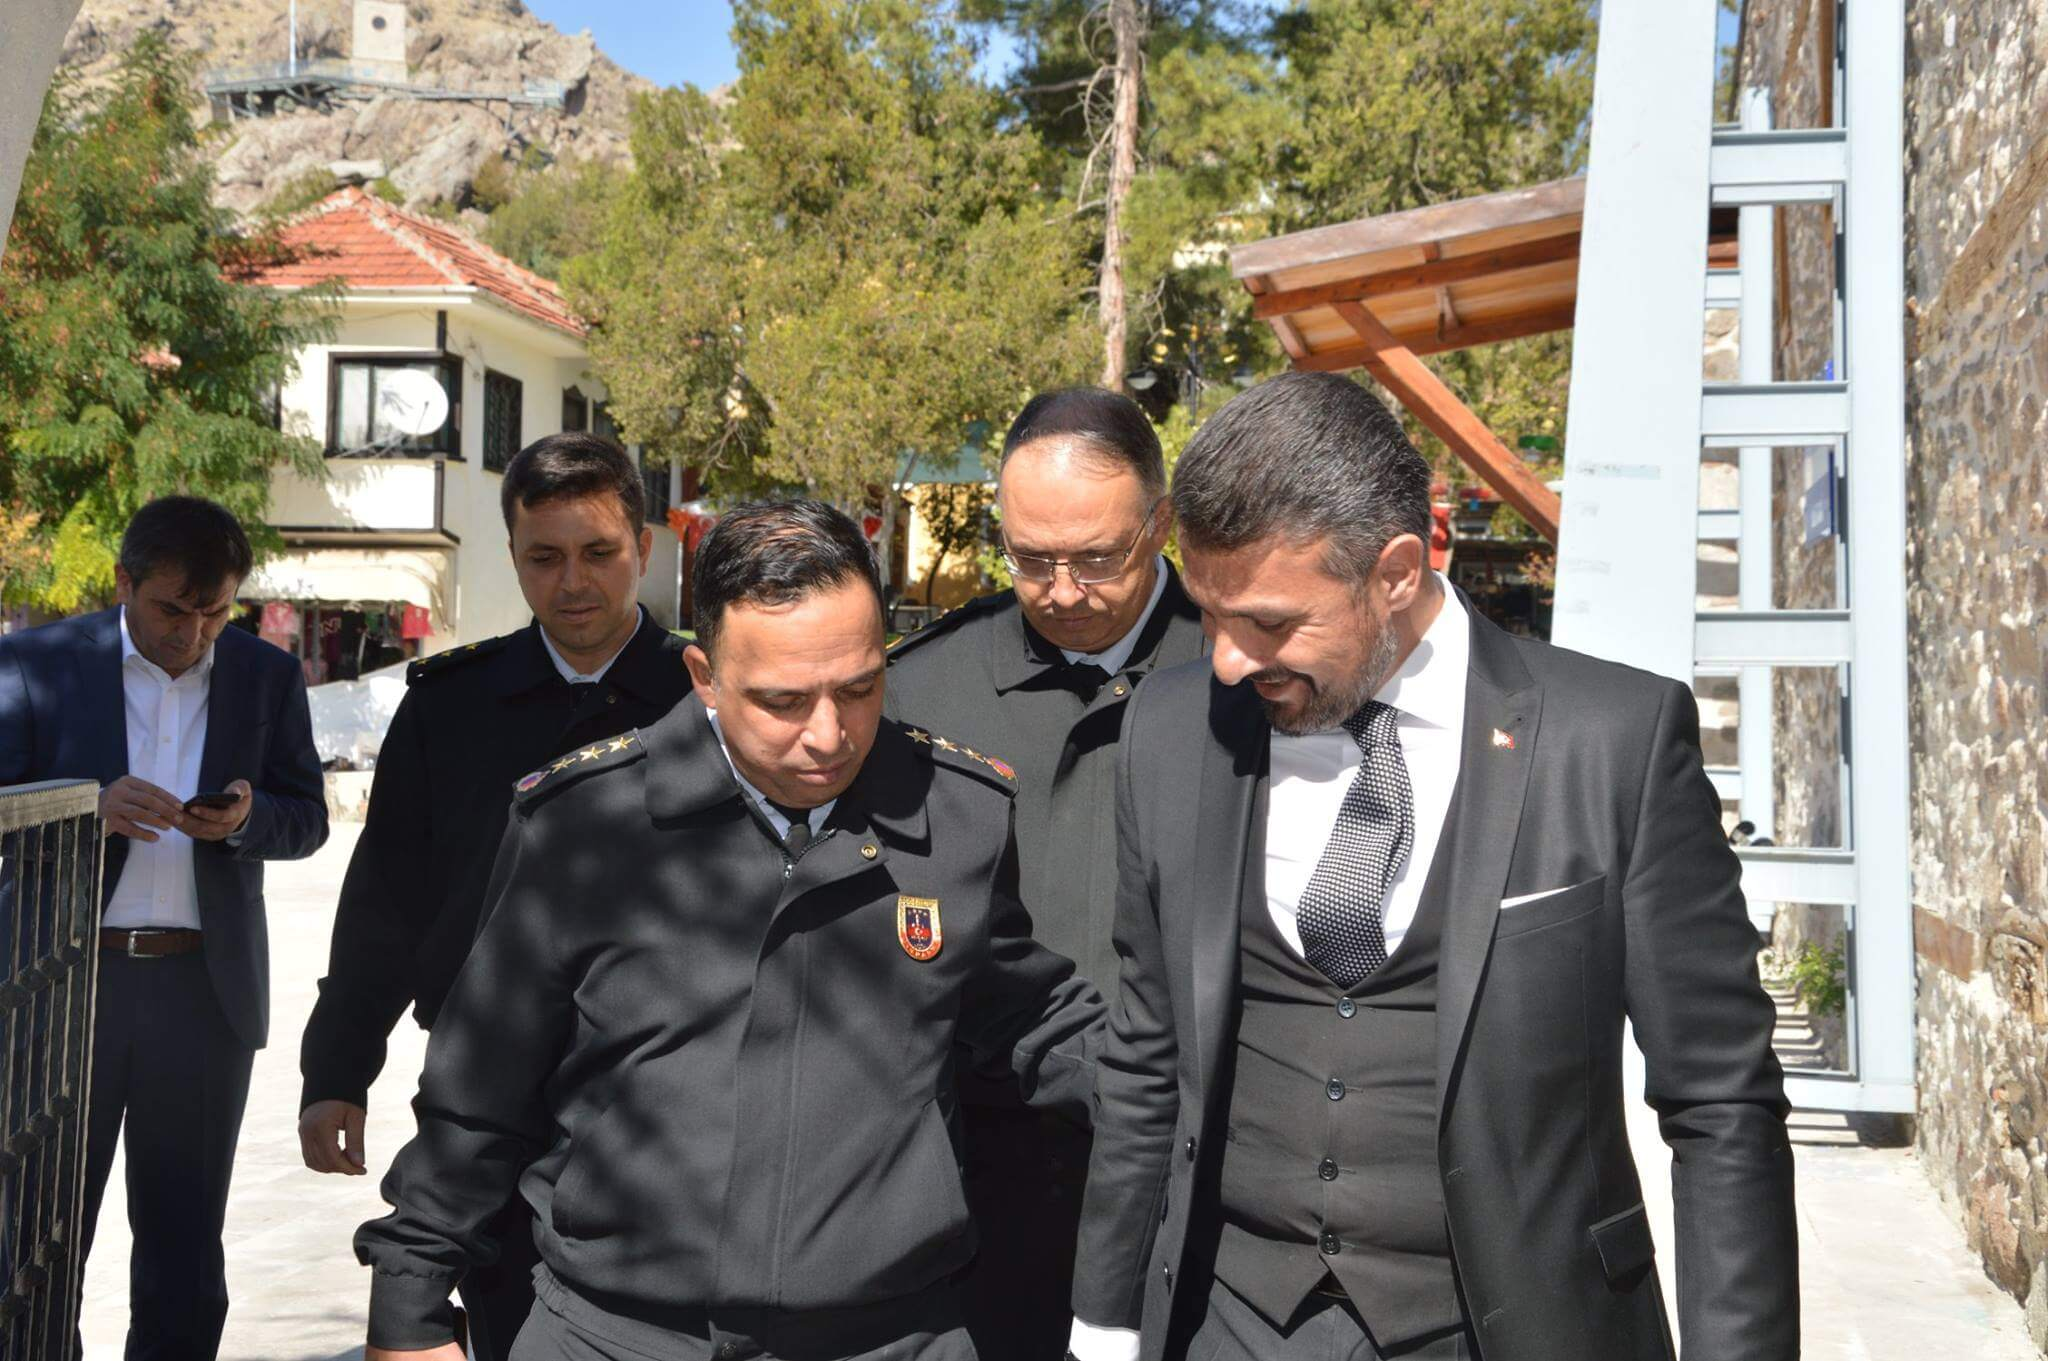 Eskişehir İl Jandarma Komutanı Kıdemli Albay İlhan Şen ilçemizi ziyaret etti.